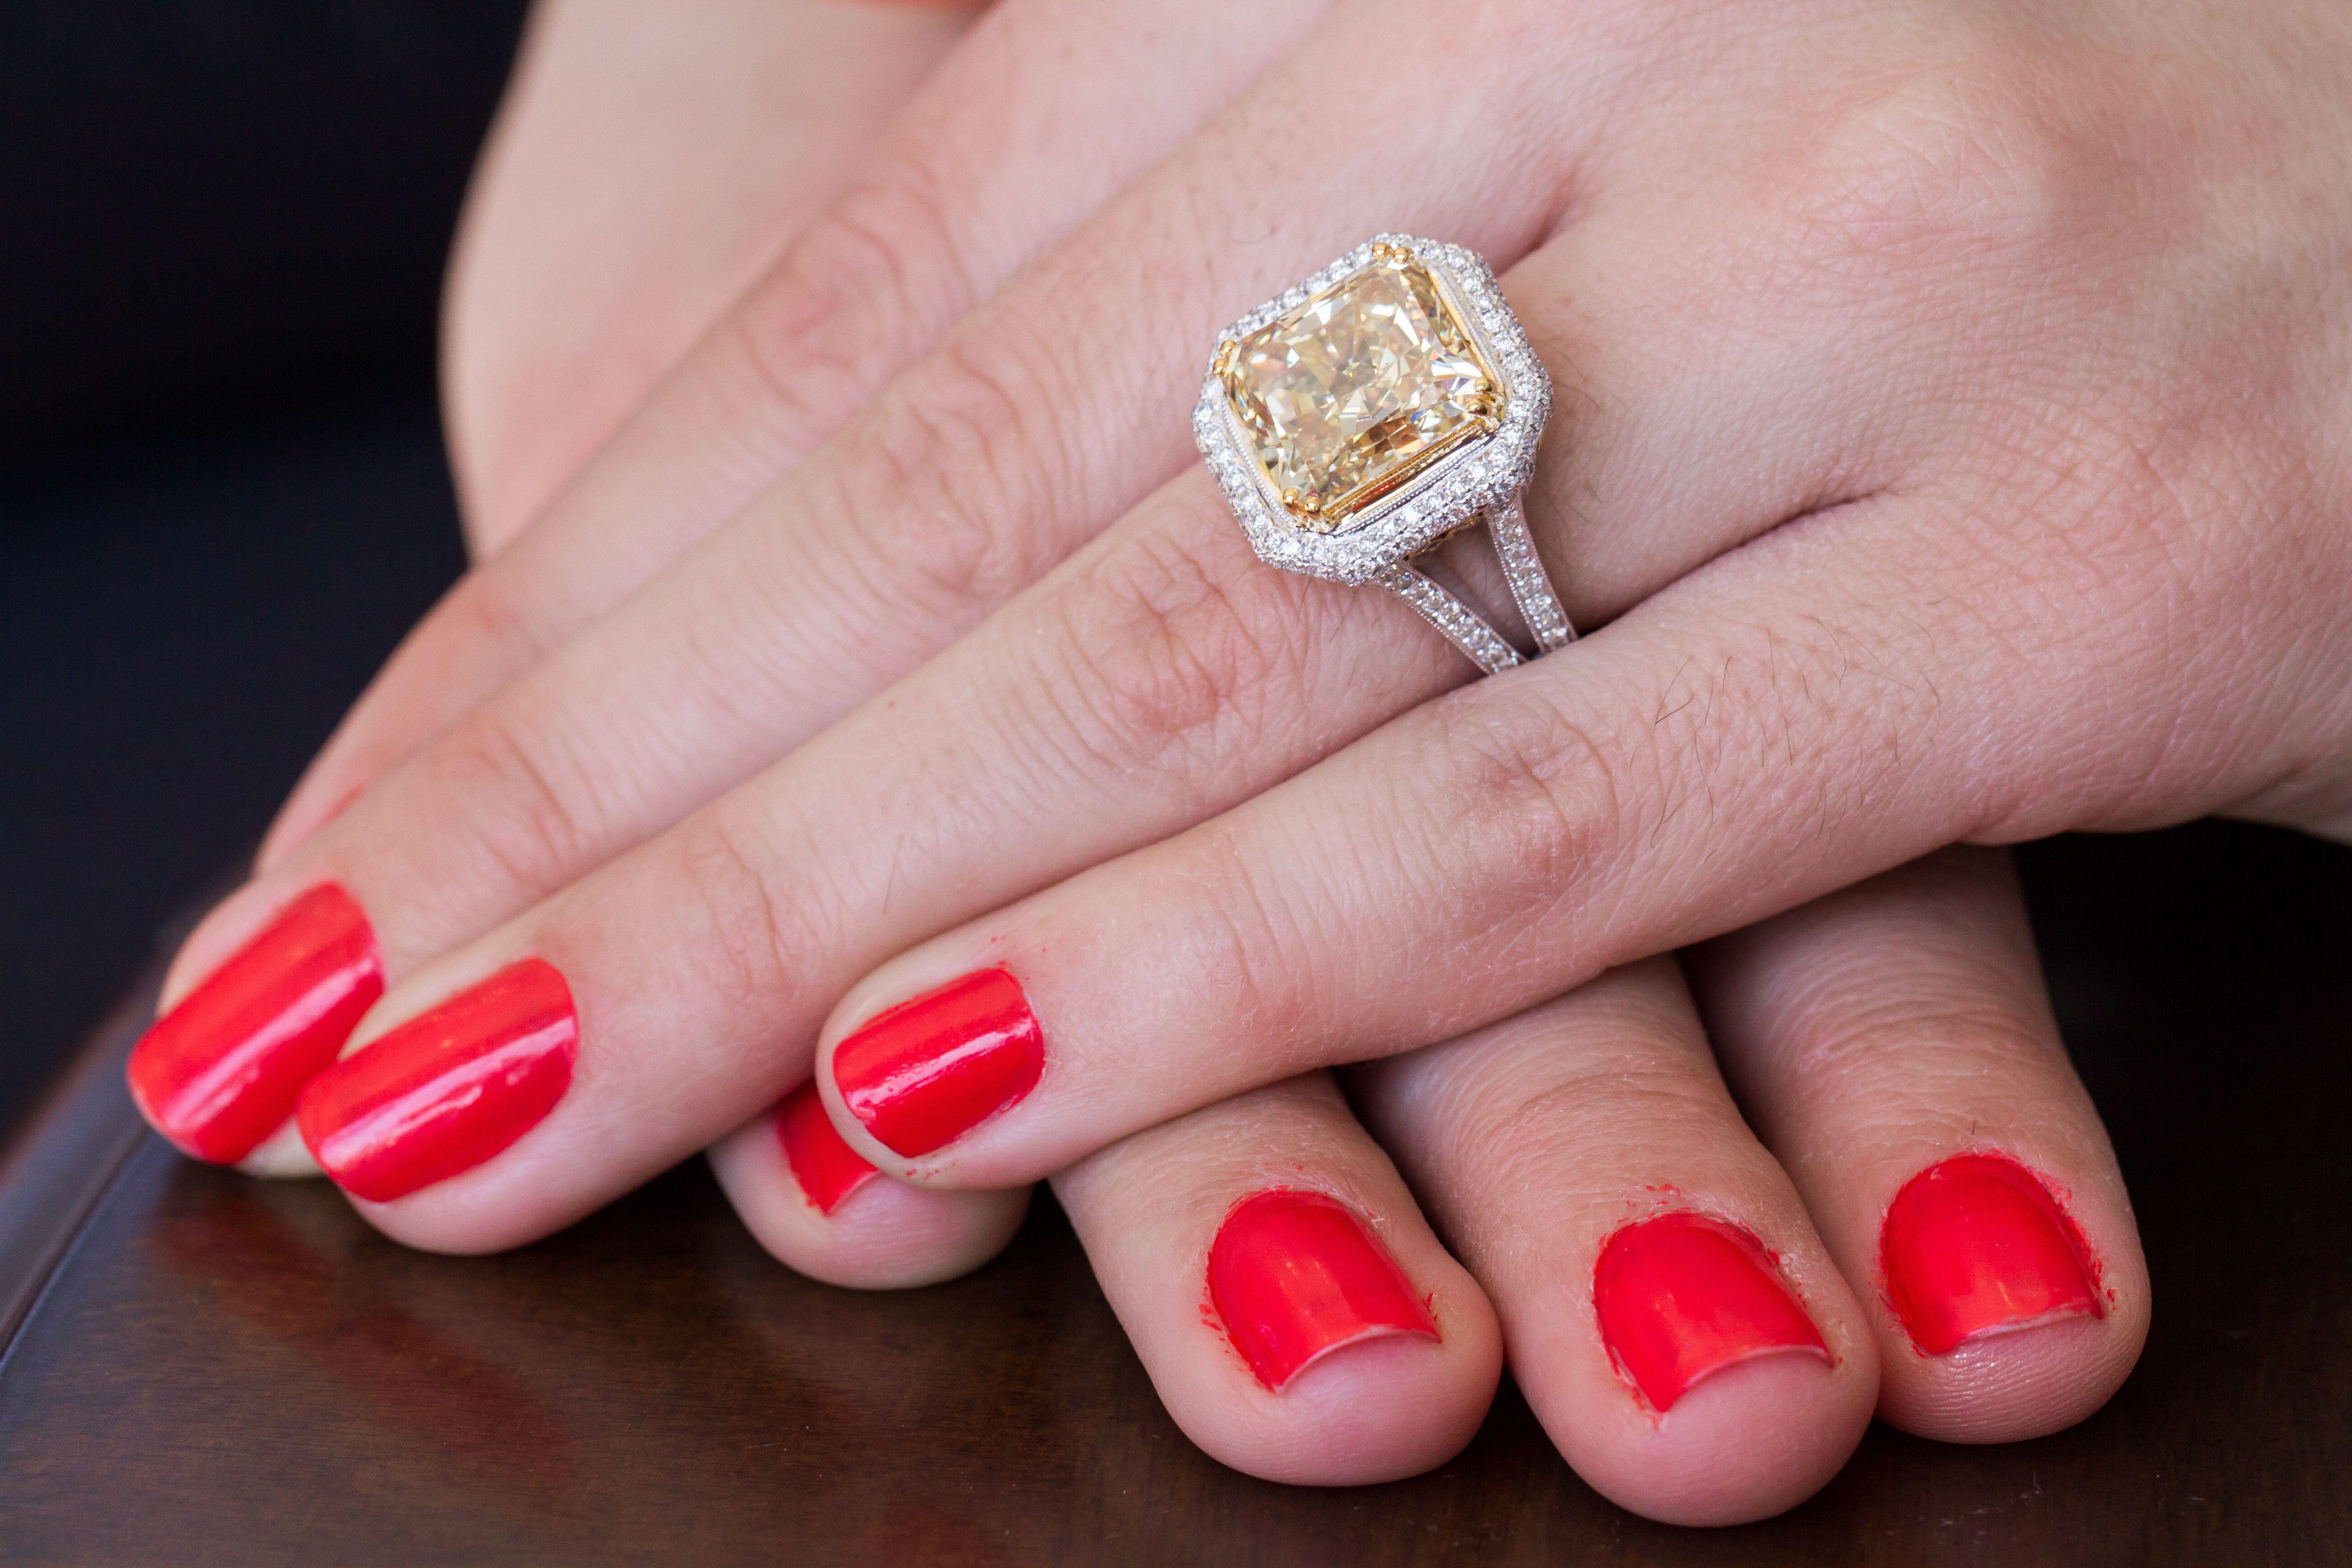 Avianti 18k White Gold Yellow Canary Diamond Ring, http://blog ...